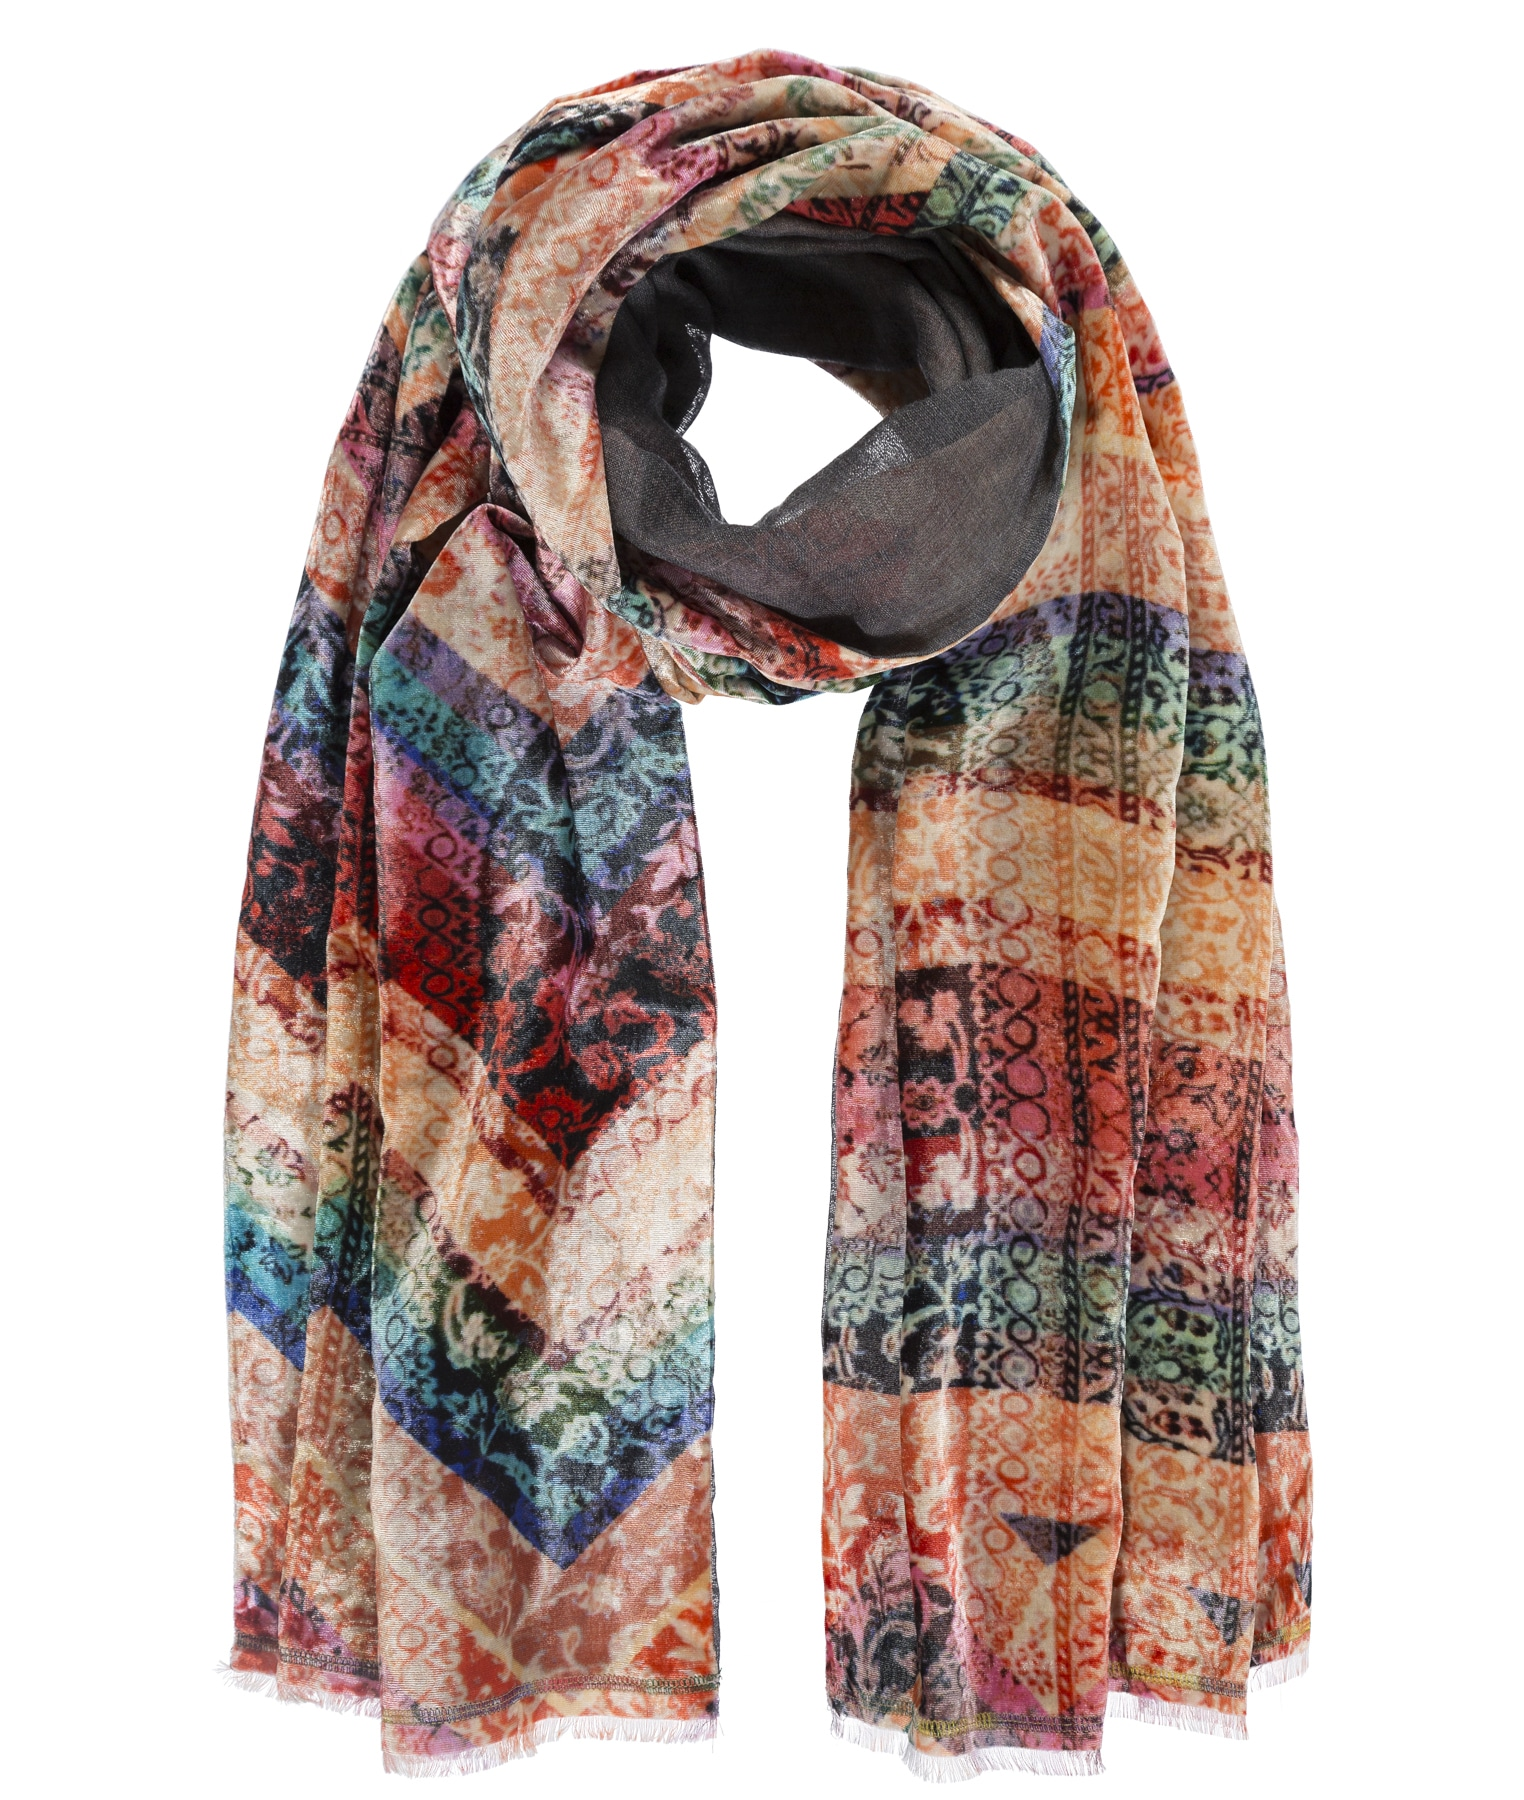 passigatti -  Schal, mit Digitalprint